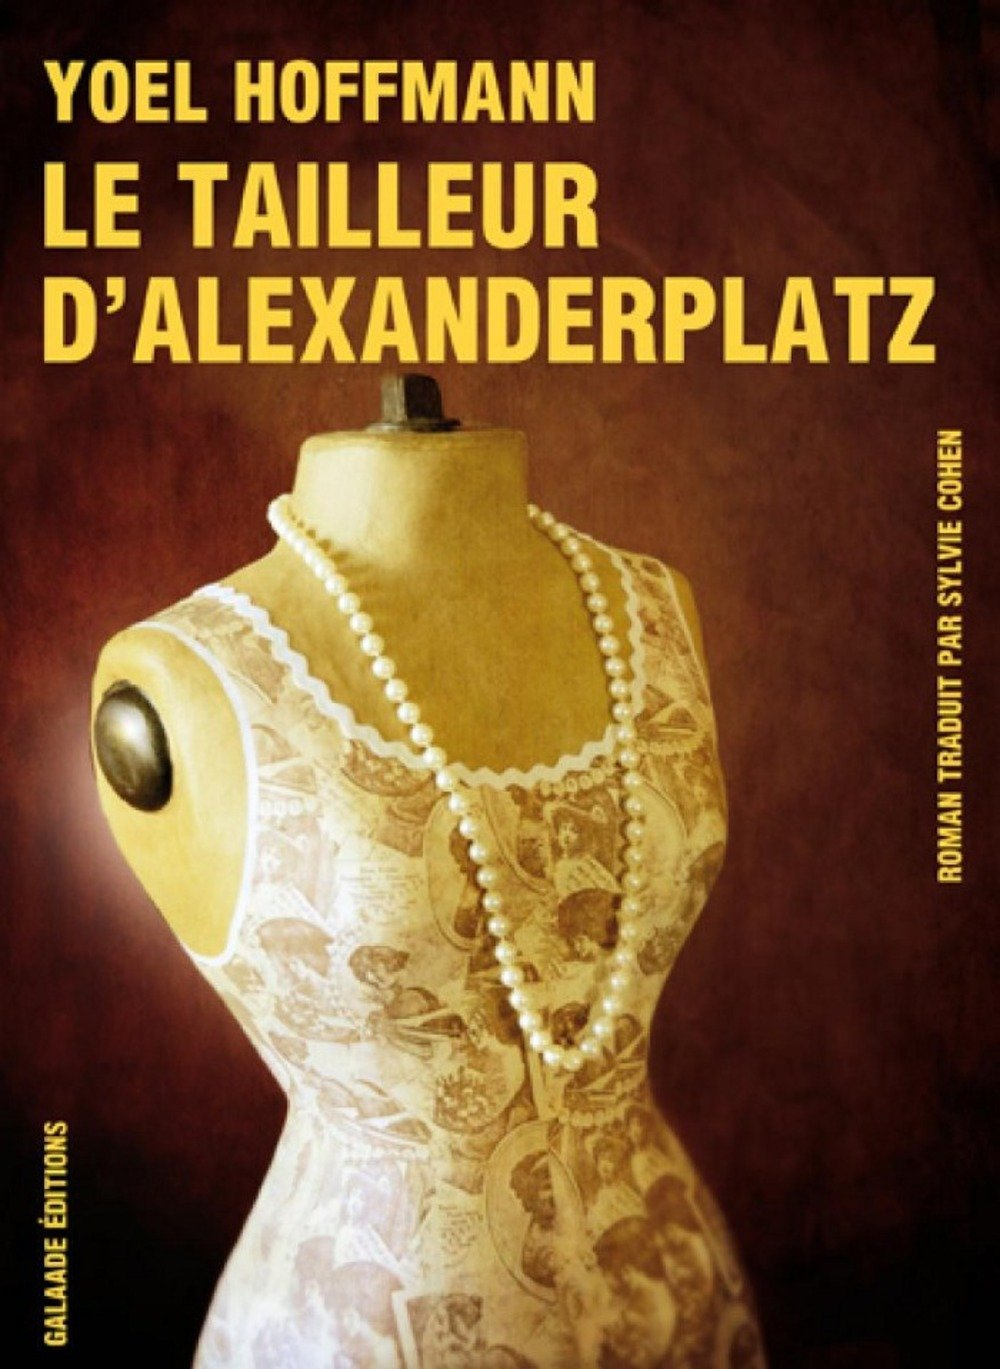 Le Tailleur D'Alexanderplatz - France Jan. 2013.jpg